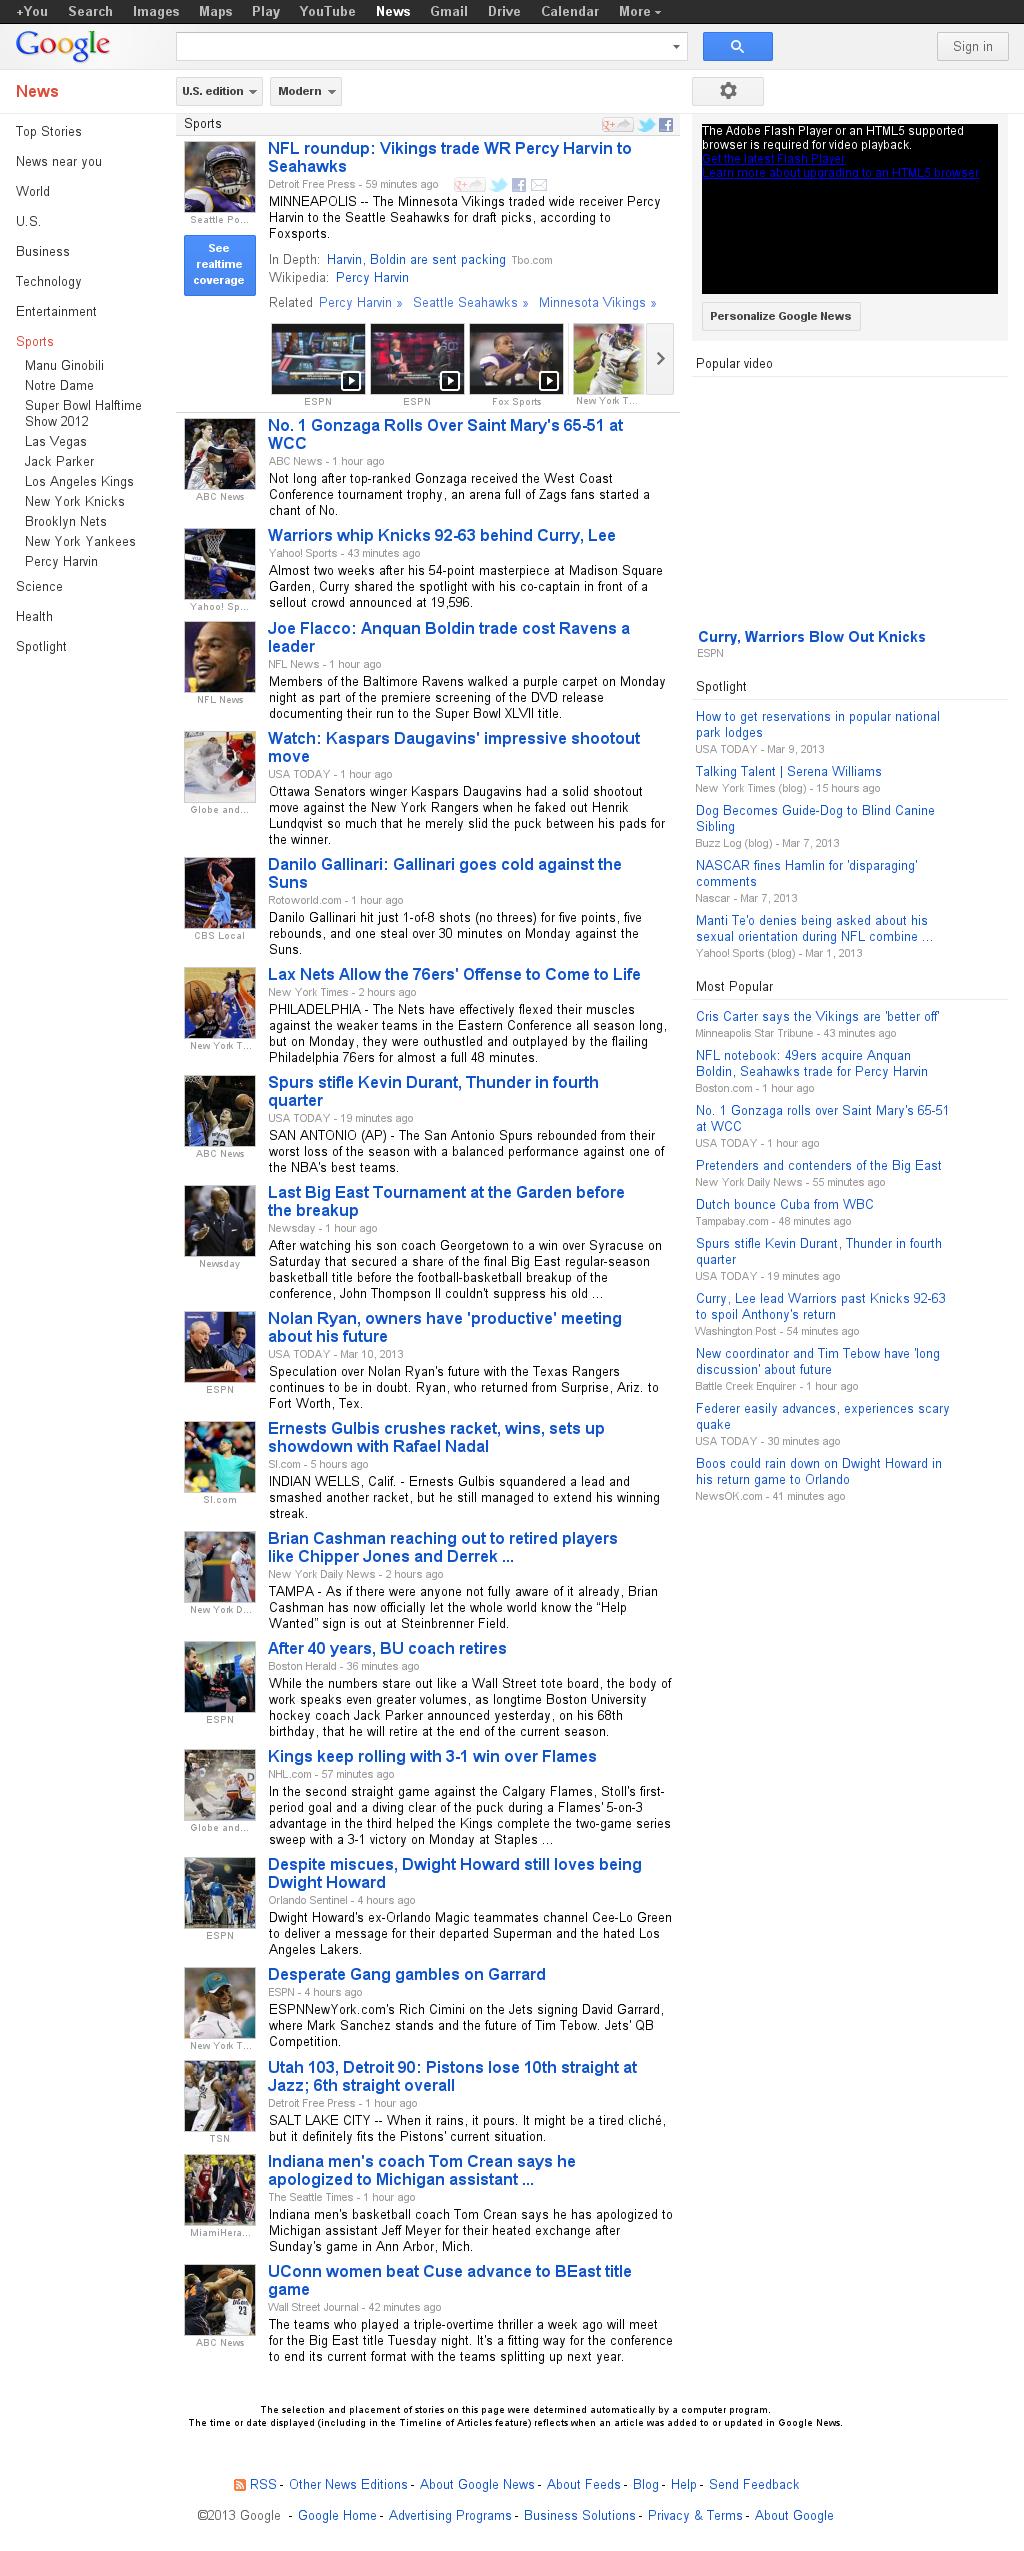 Google News: Sports at Tuesday March 12, 2013, 6:07 a.m. UTC